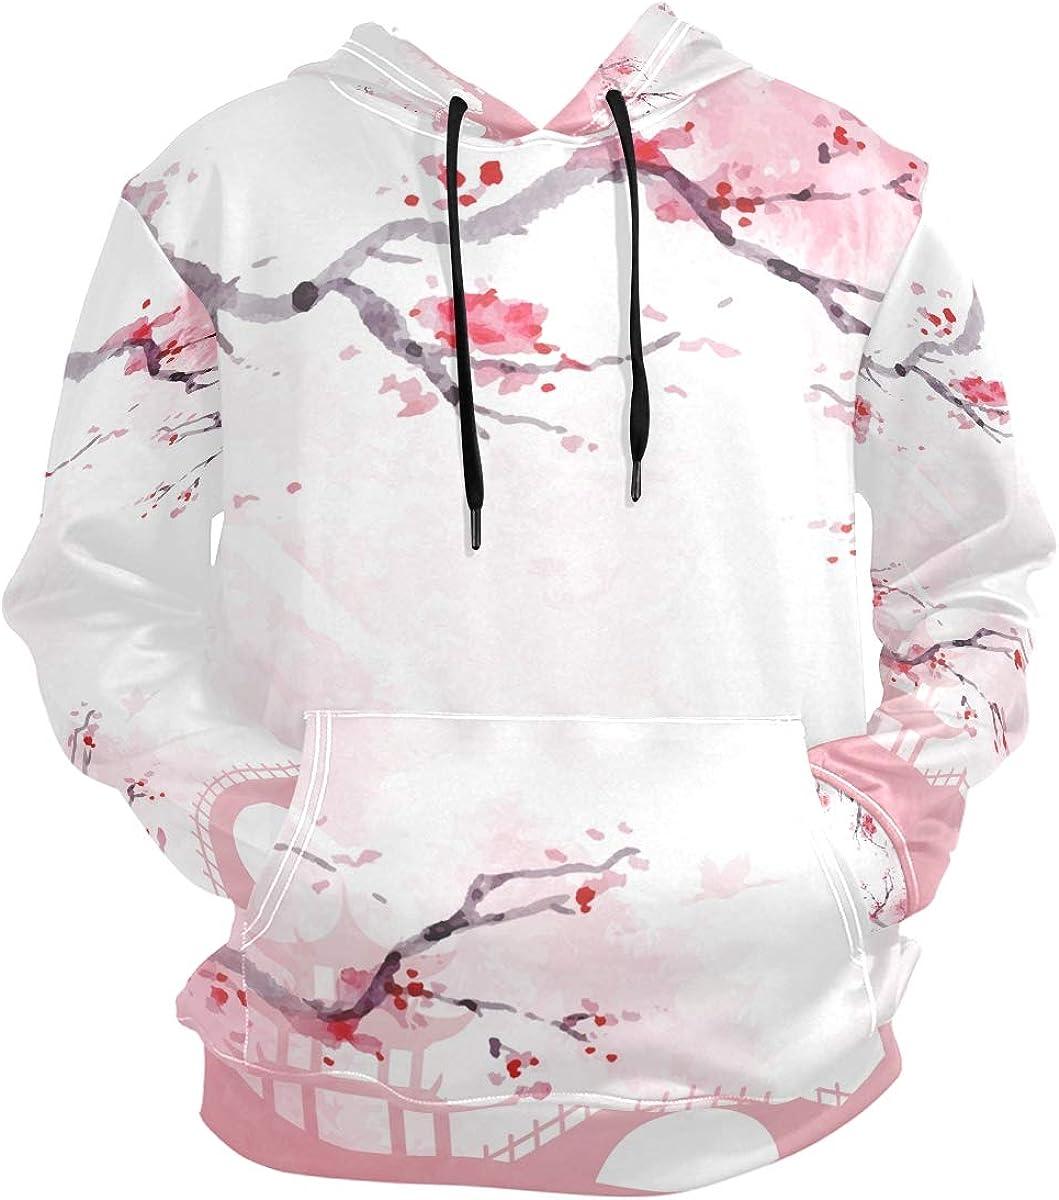 Nander Hooded Sweatshirts Japanese Cherry Blossom Unisex Men's P